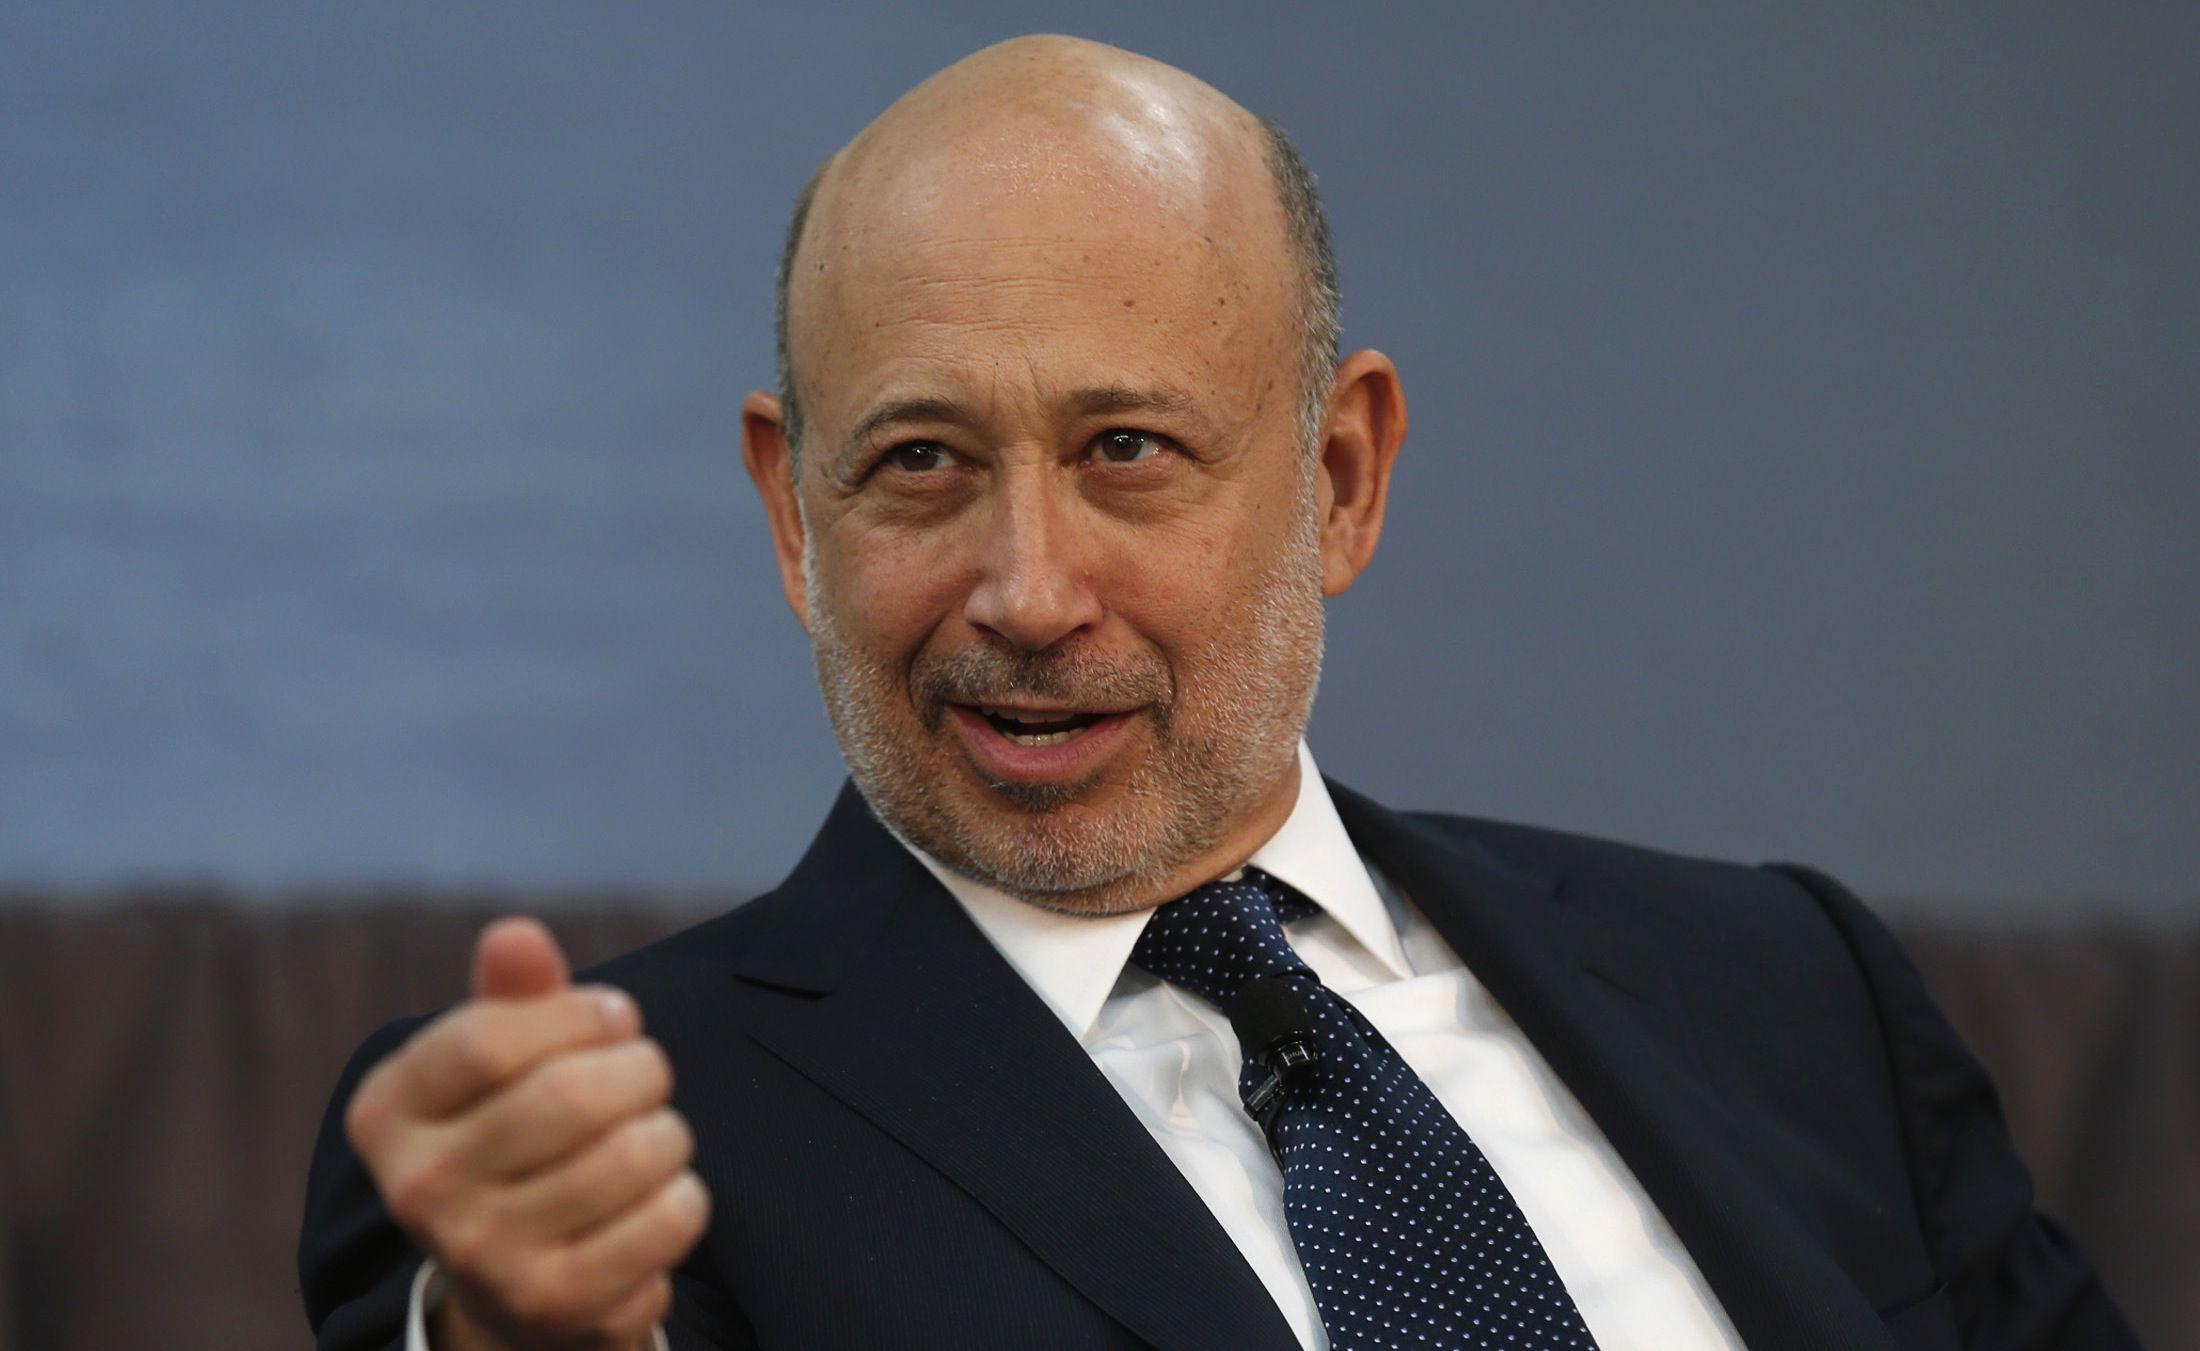 Goldman's CEO Lloyd Blankfein